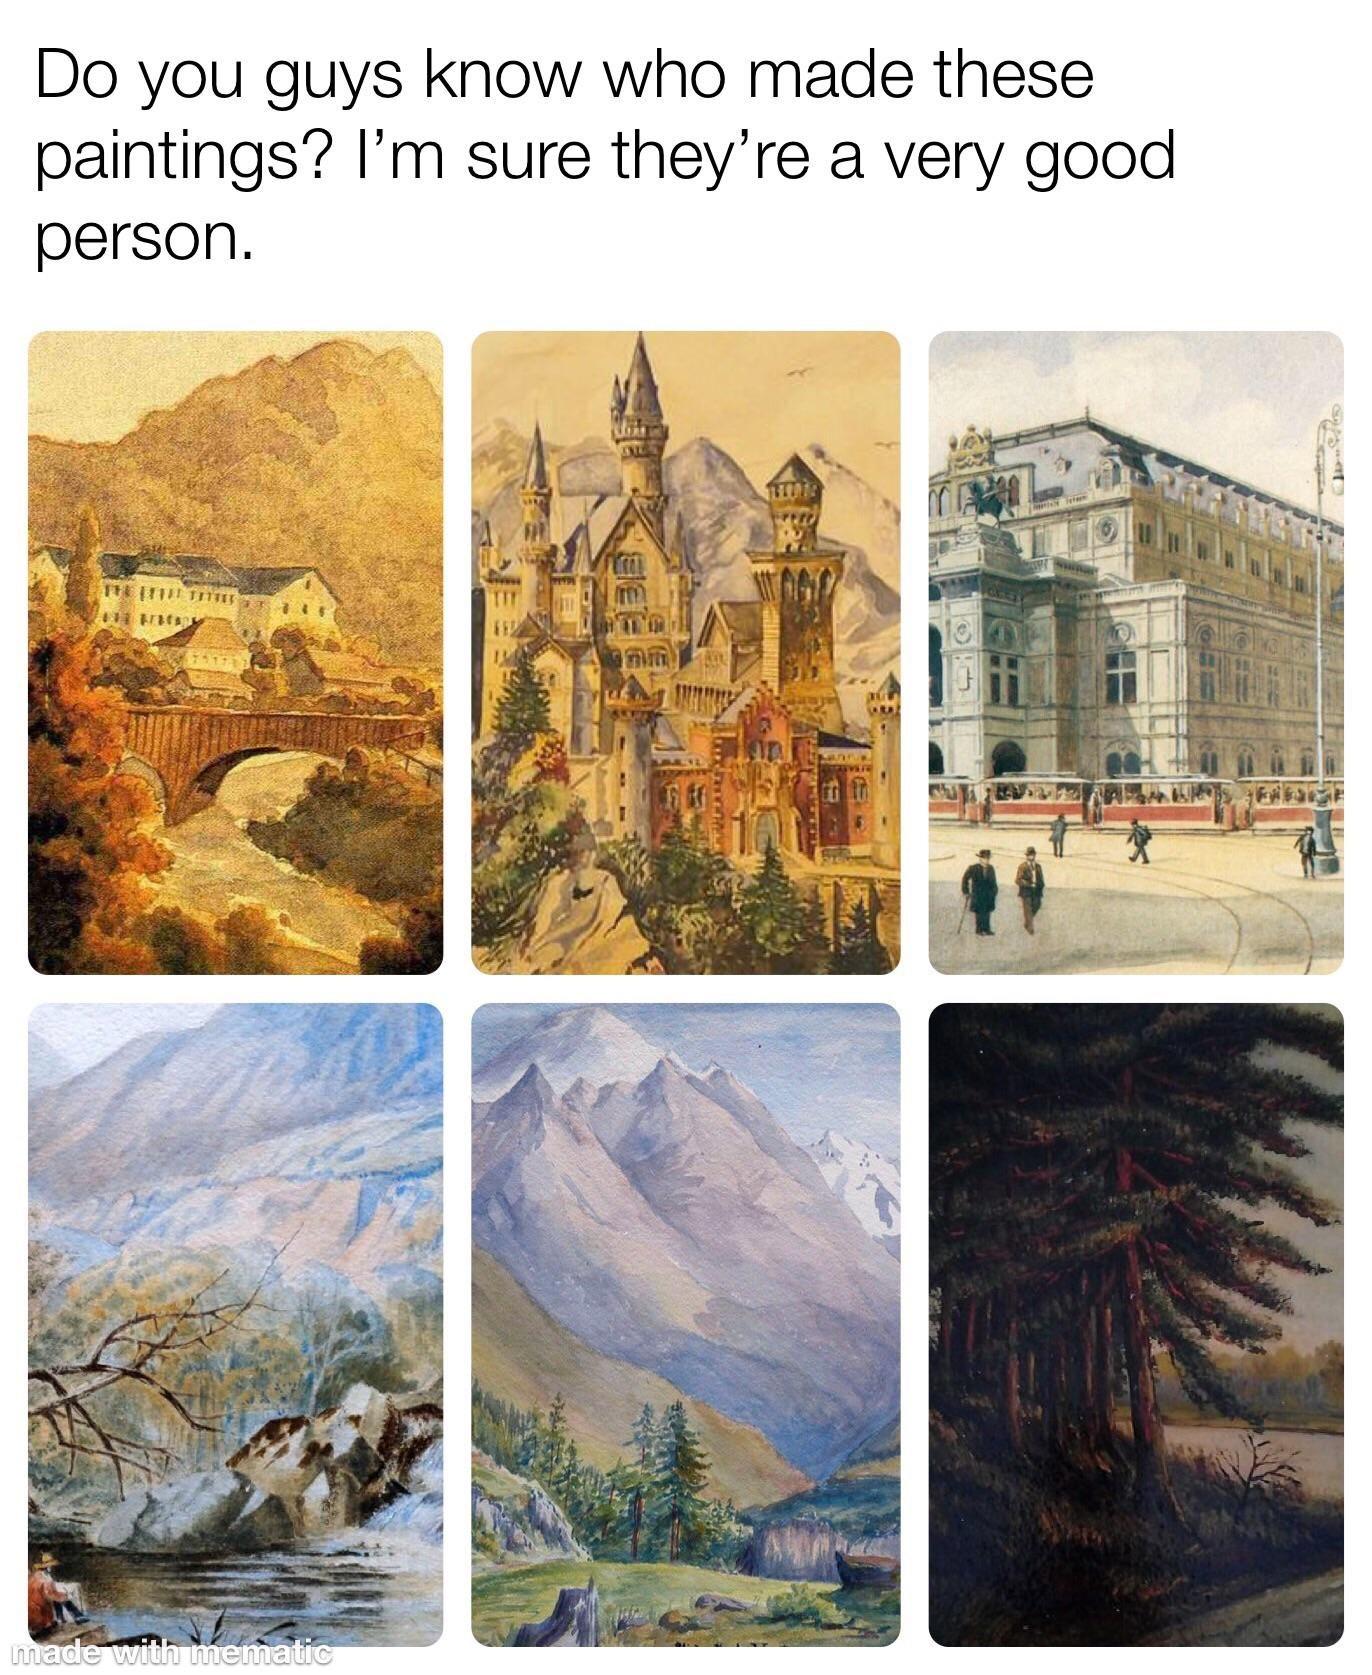 Very good artist